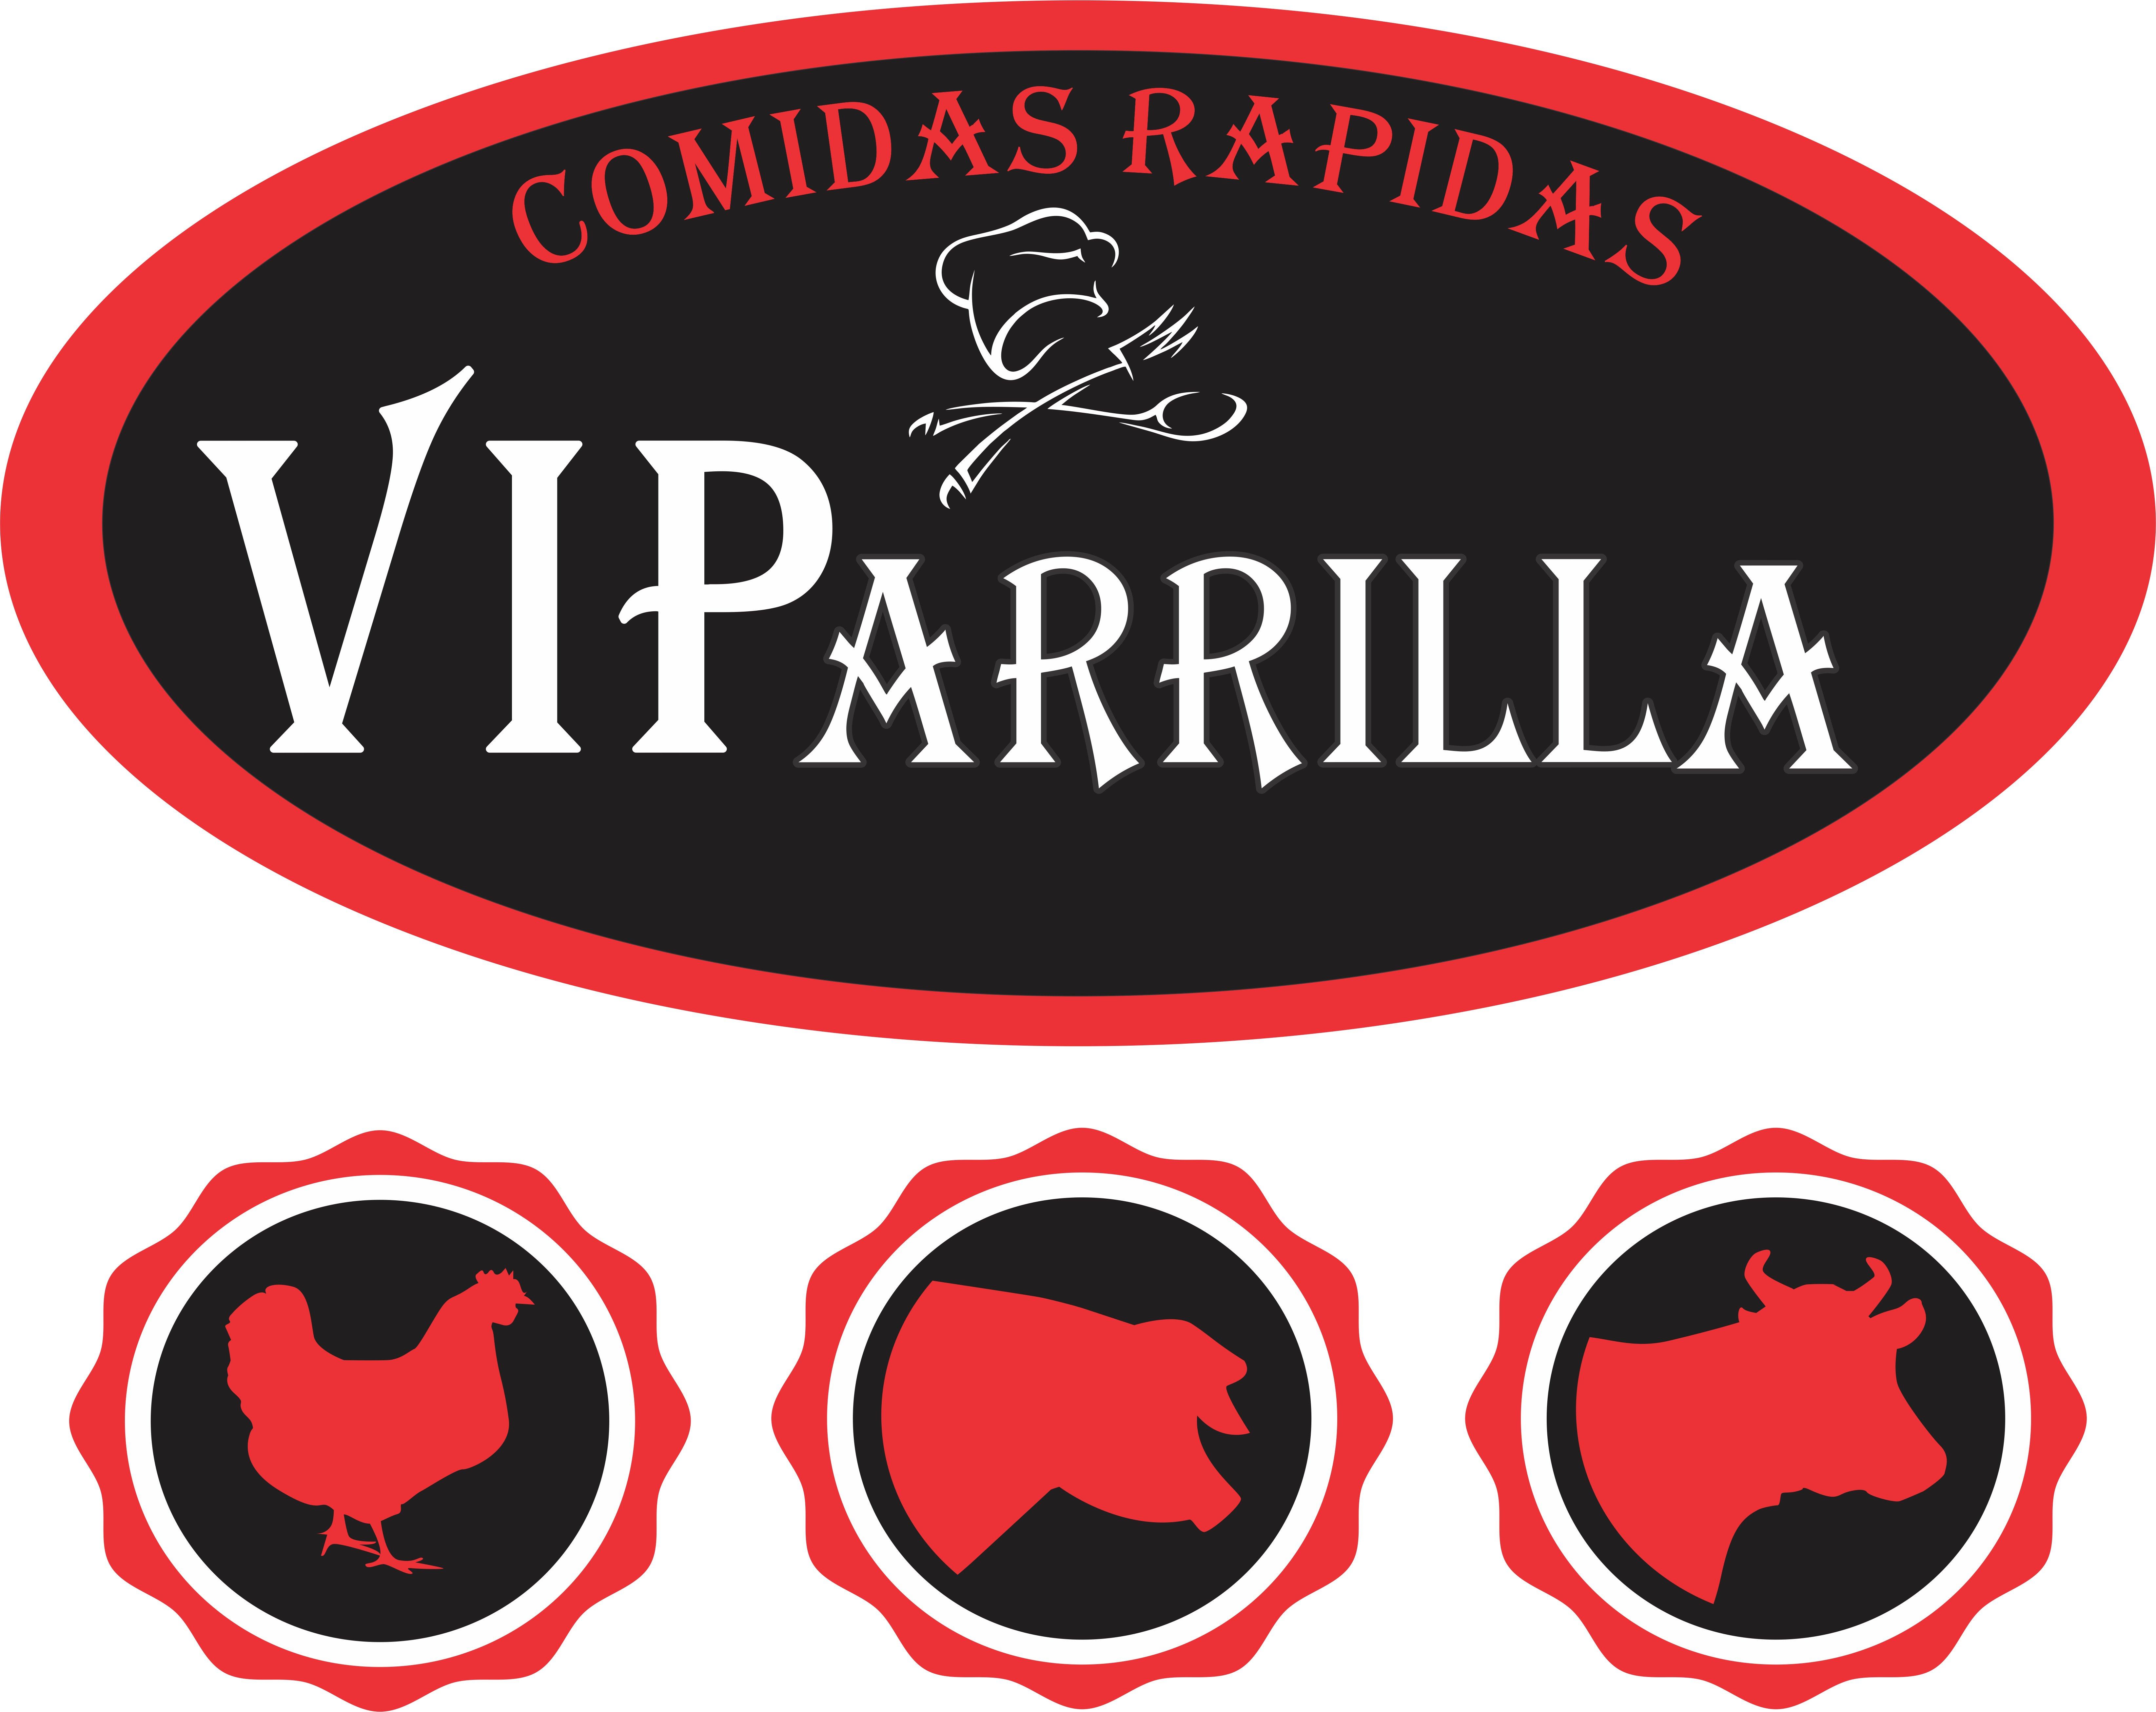 ViParrilla Las Ferias